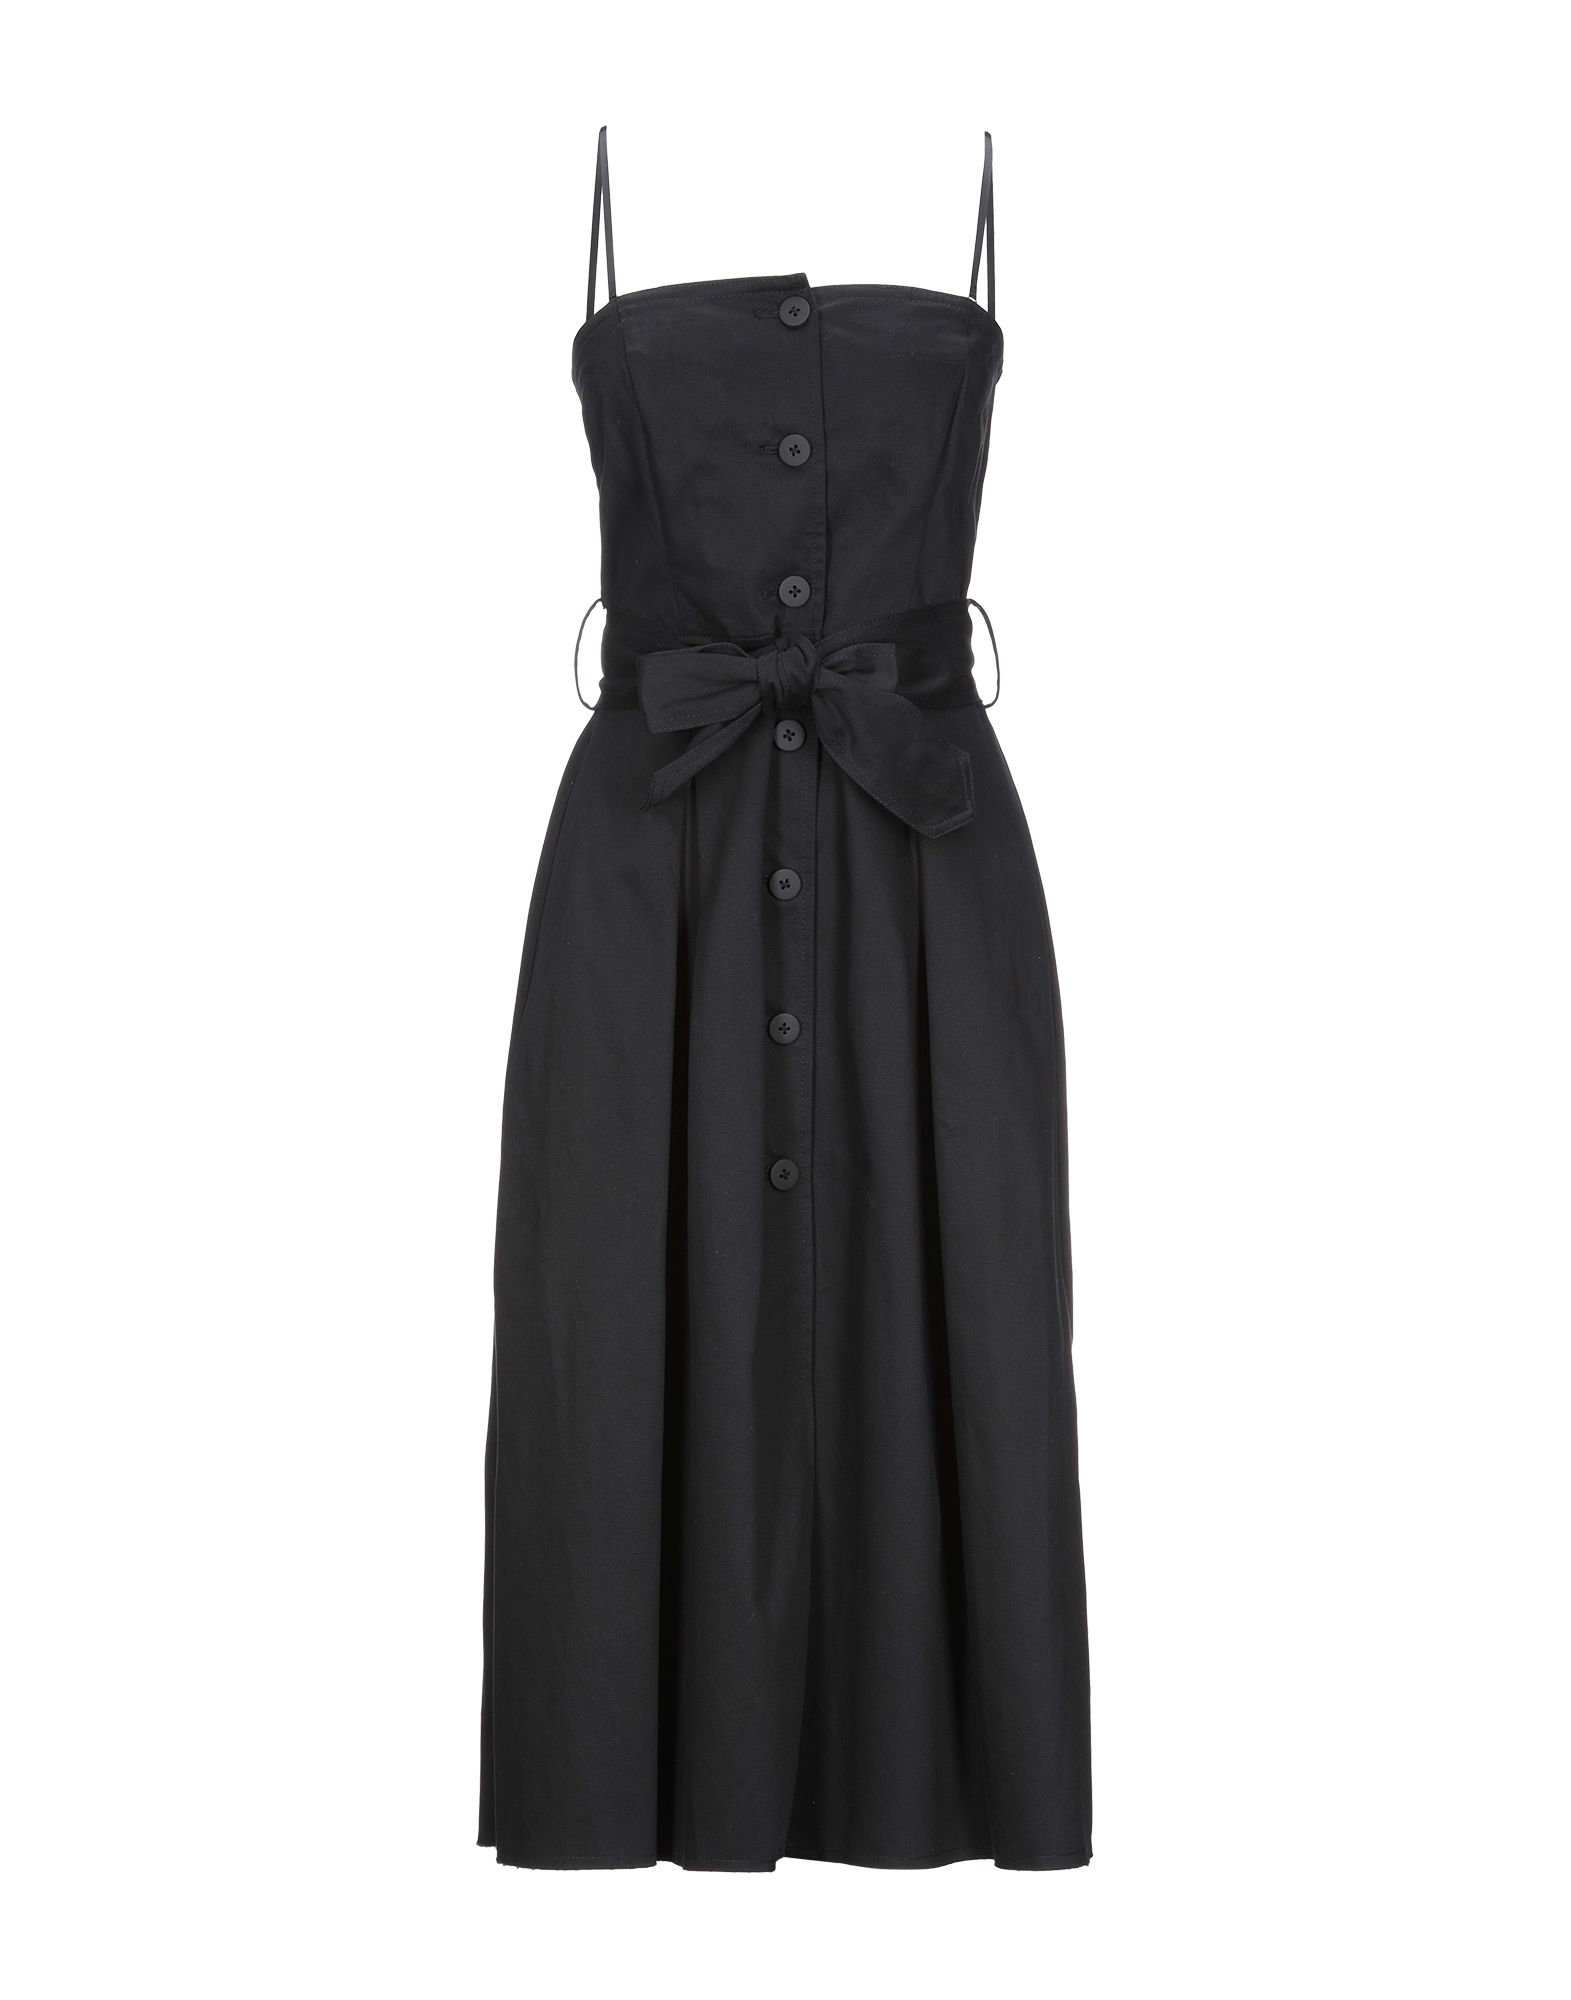 ARMANI EXCHANGE Платье длиной 3/4 emporio armani платье длиной 3 4